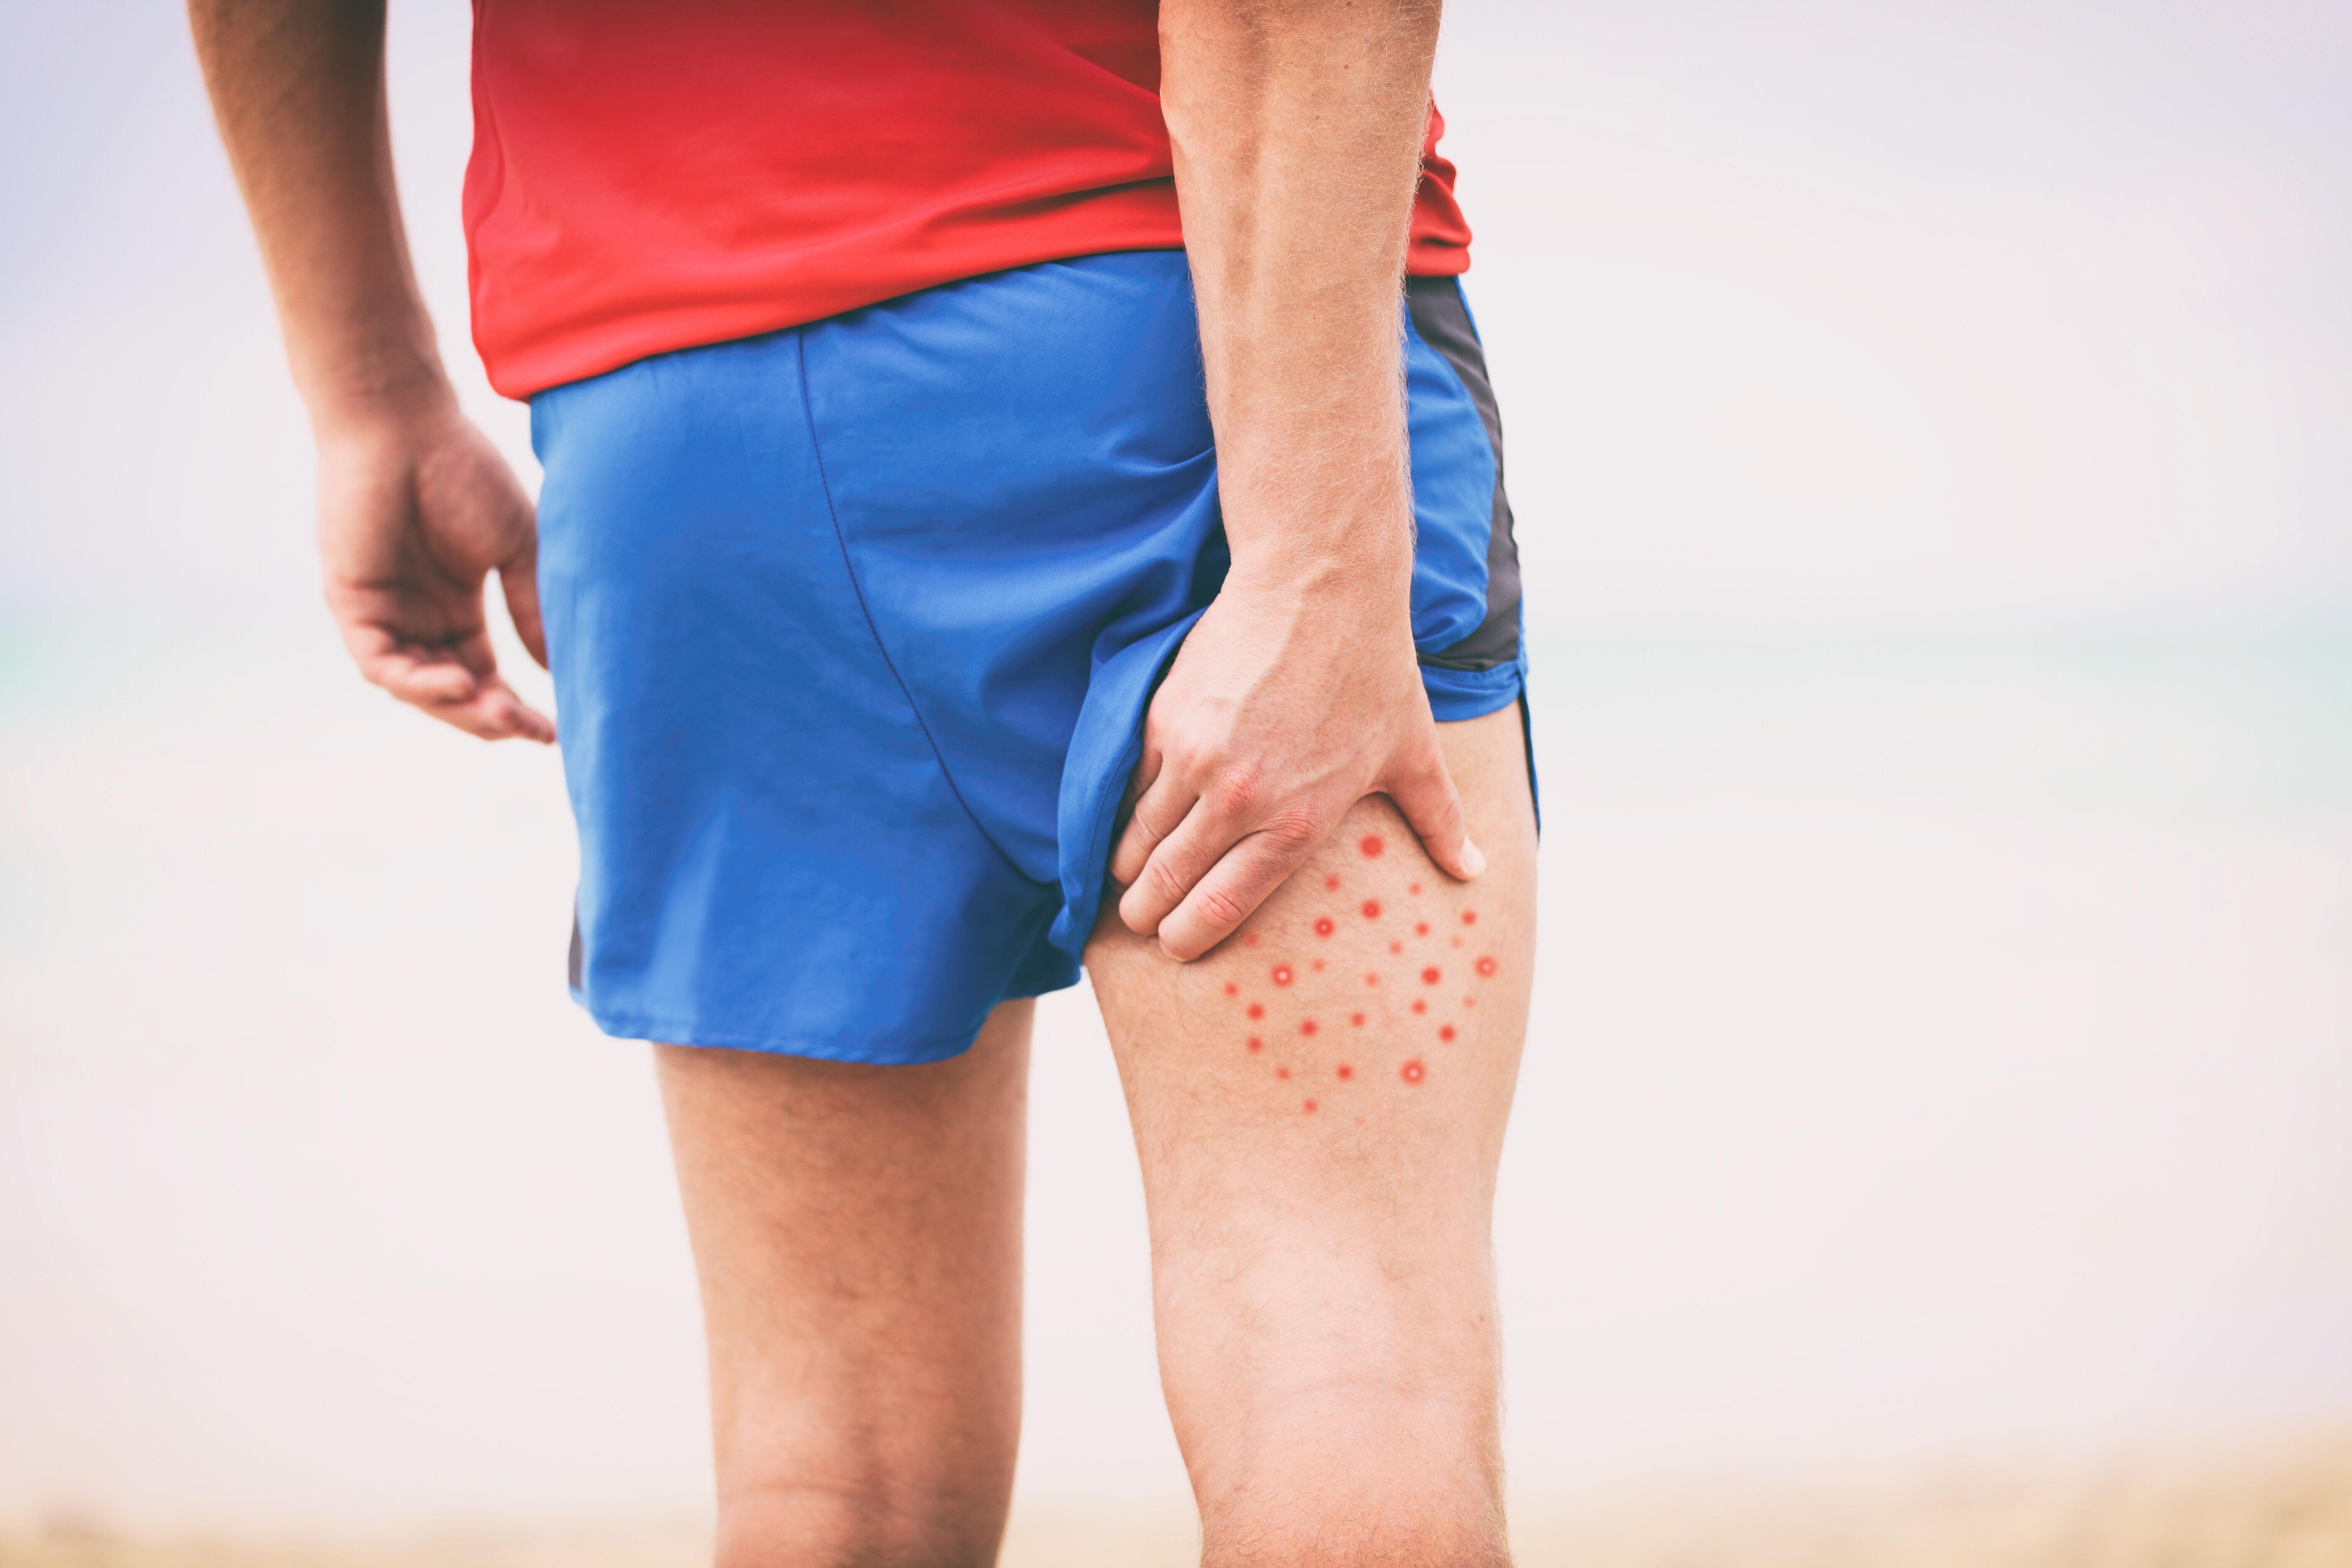 Poison ivy rash on the thigh